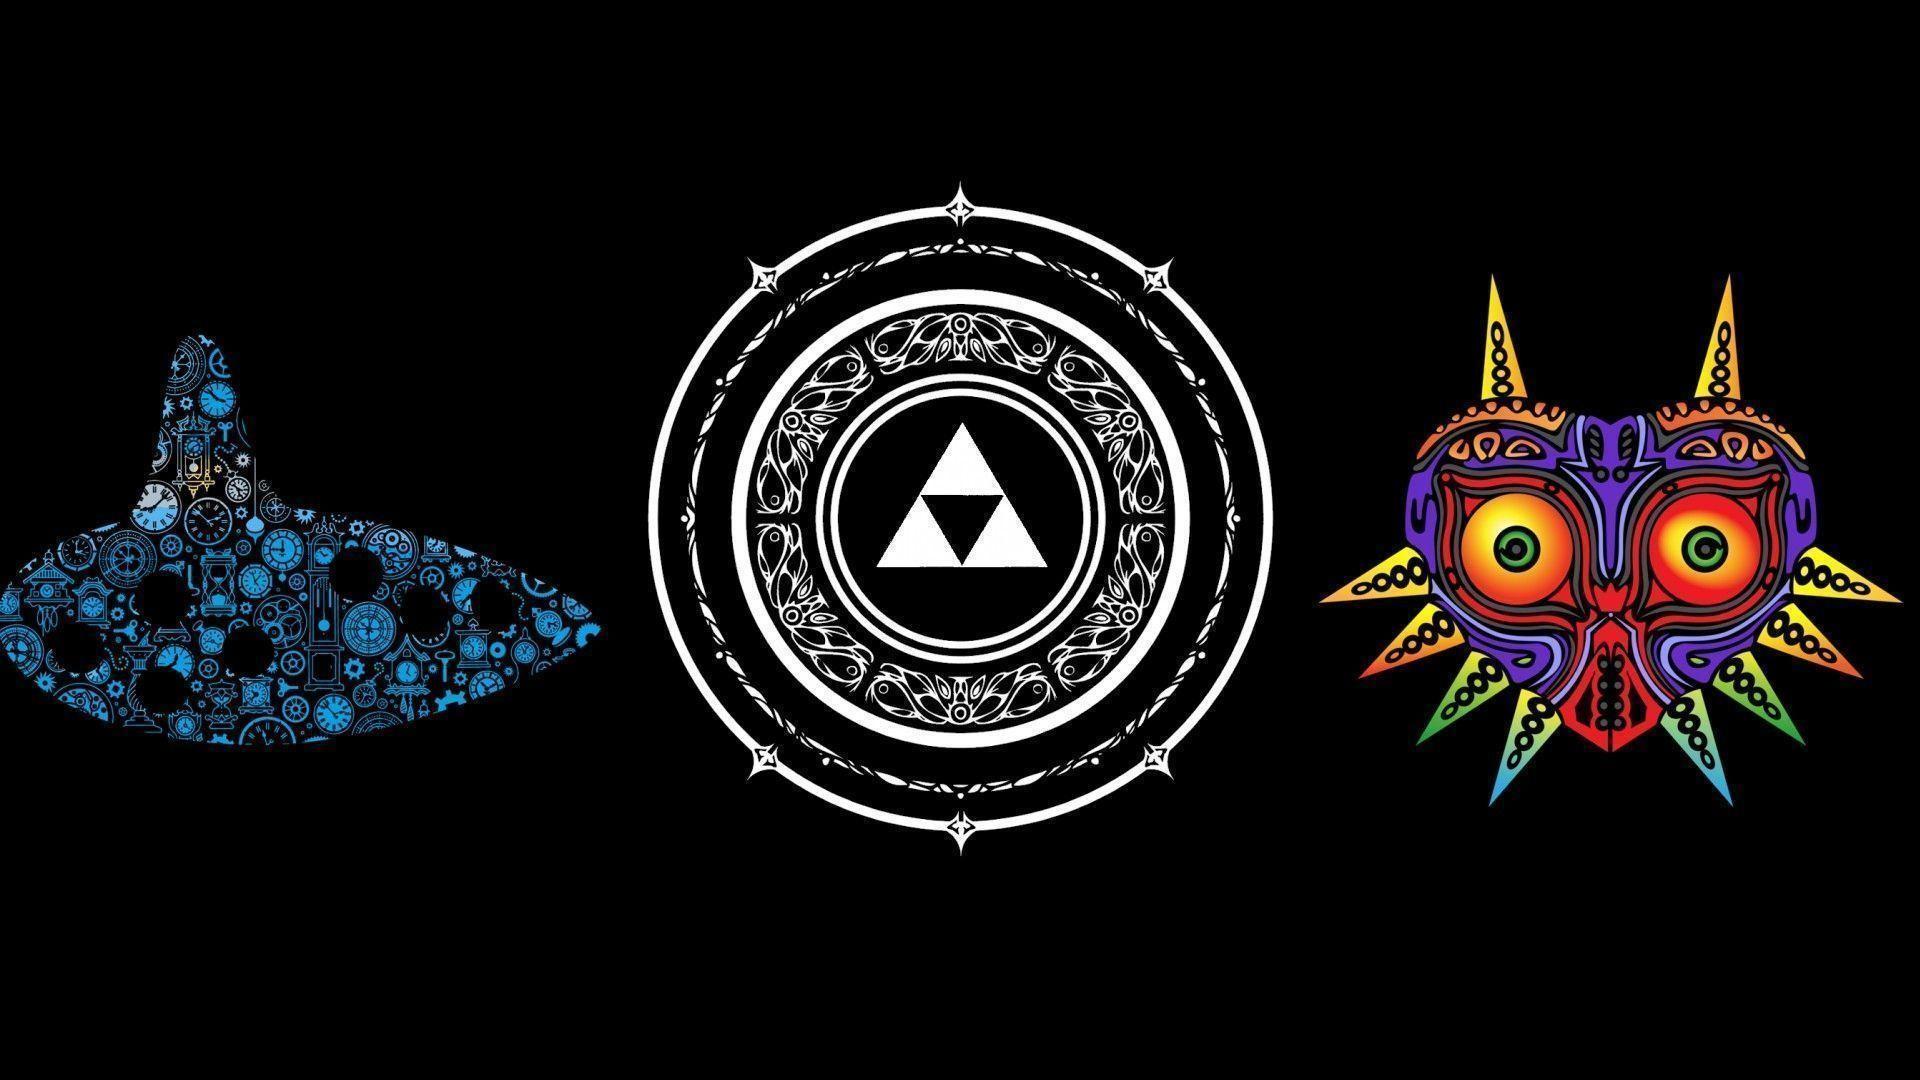 The Legend Of Zelda Majora Mask High Resolution Hd Wallpaper